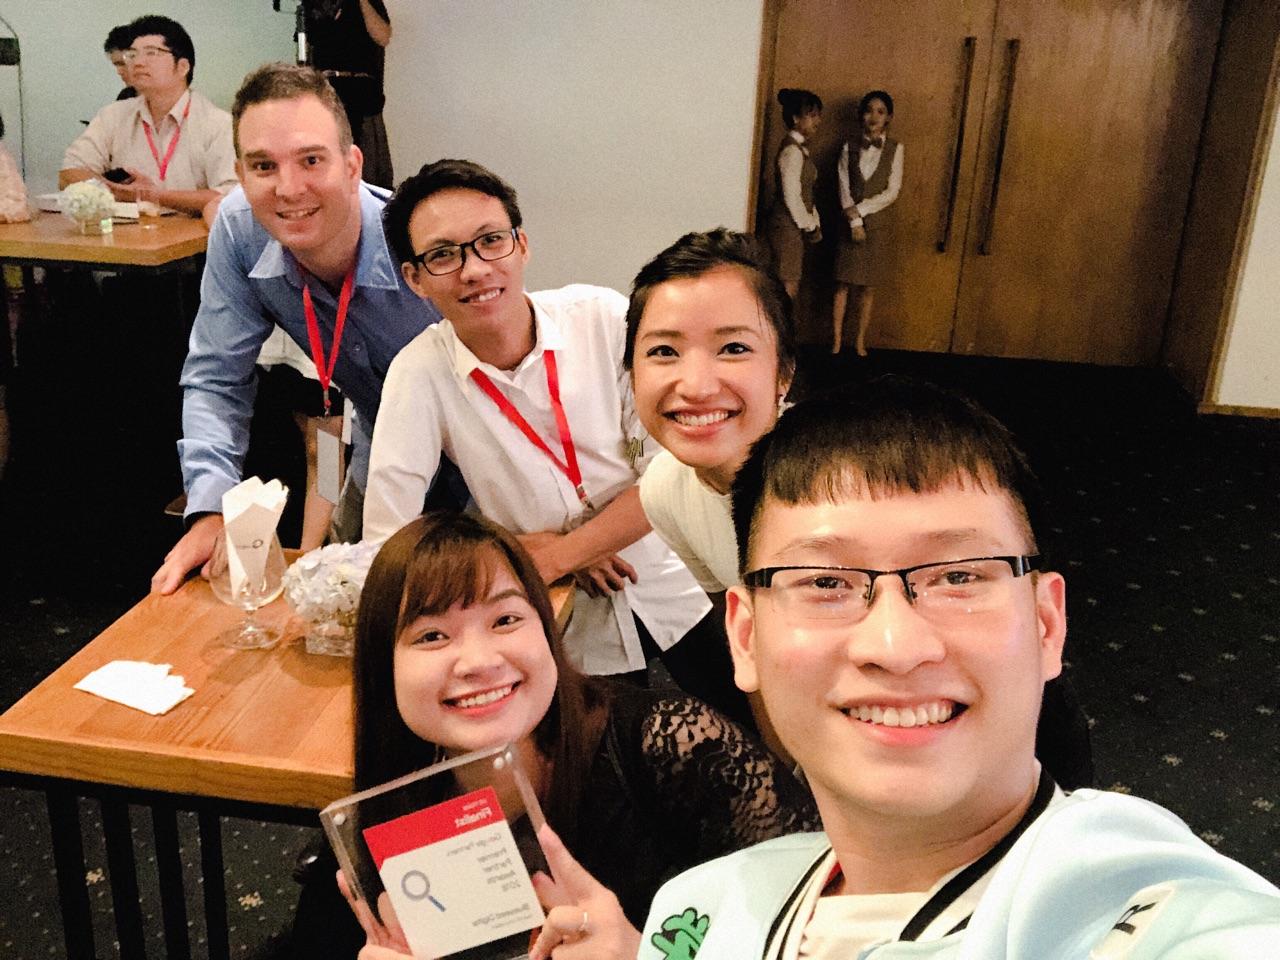 Bluesummit team at Google Premier Partner's Awards event 2018